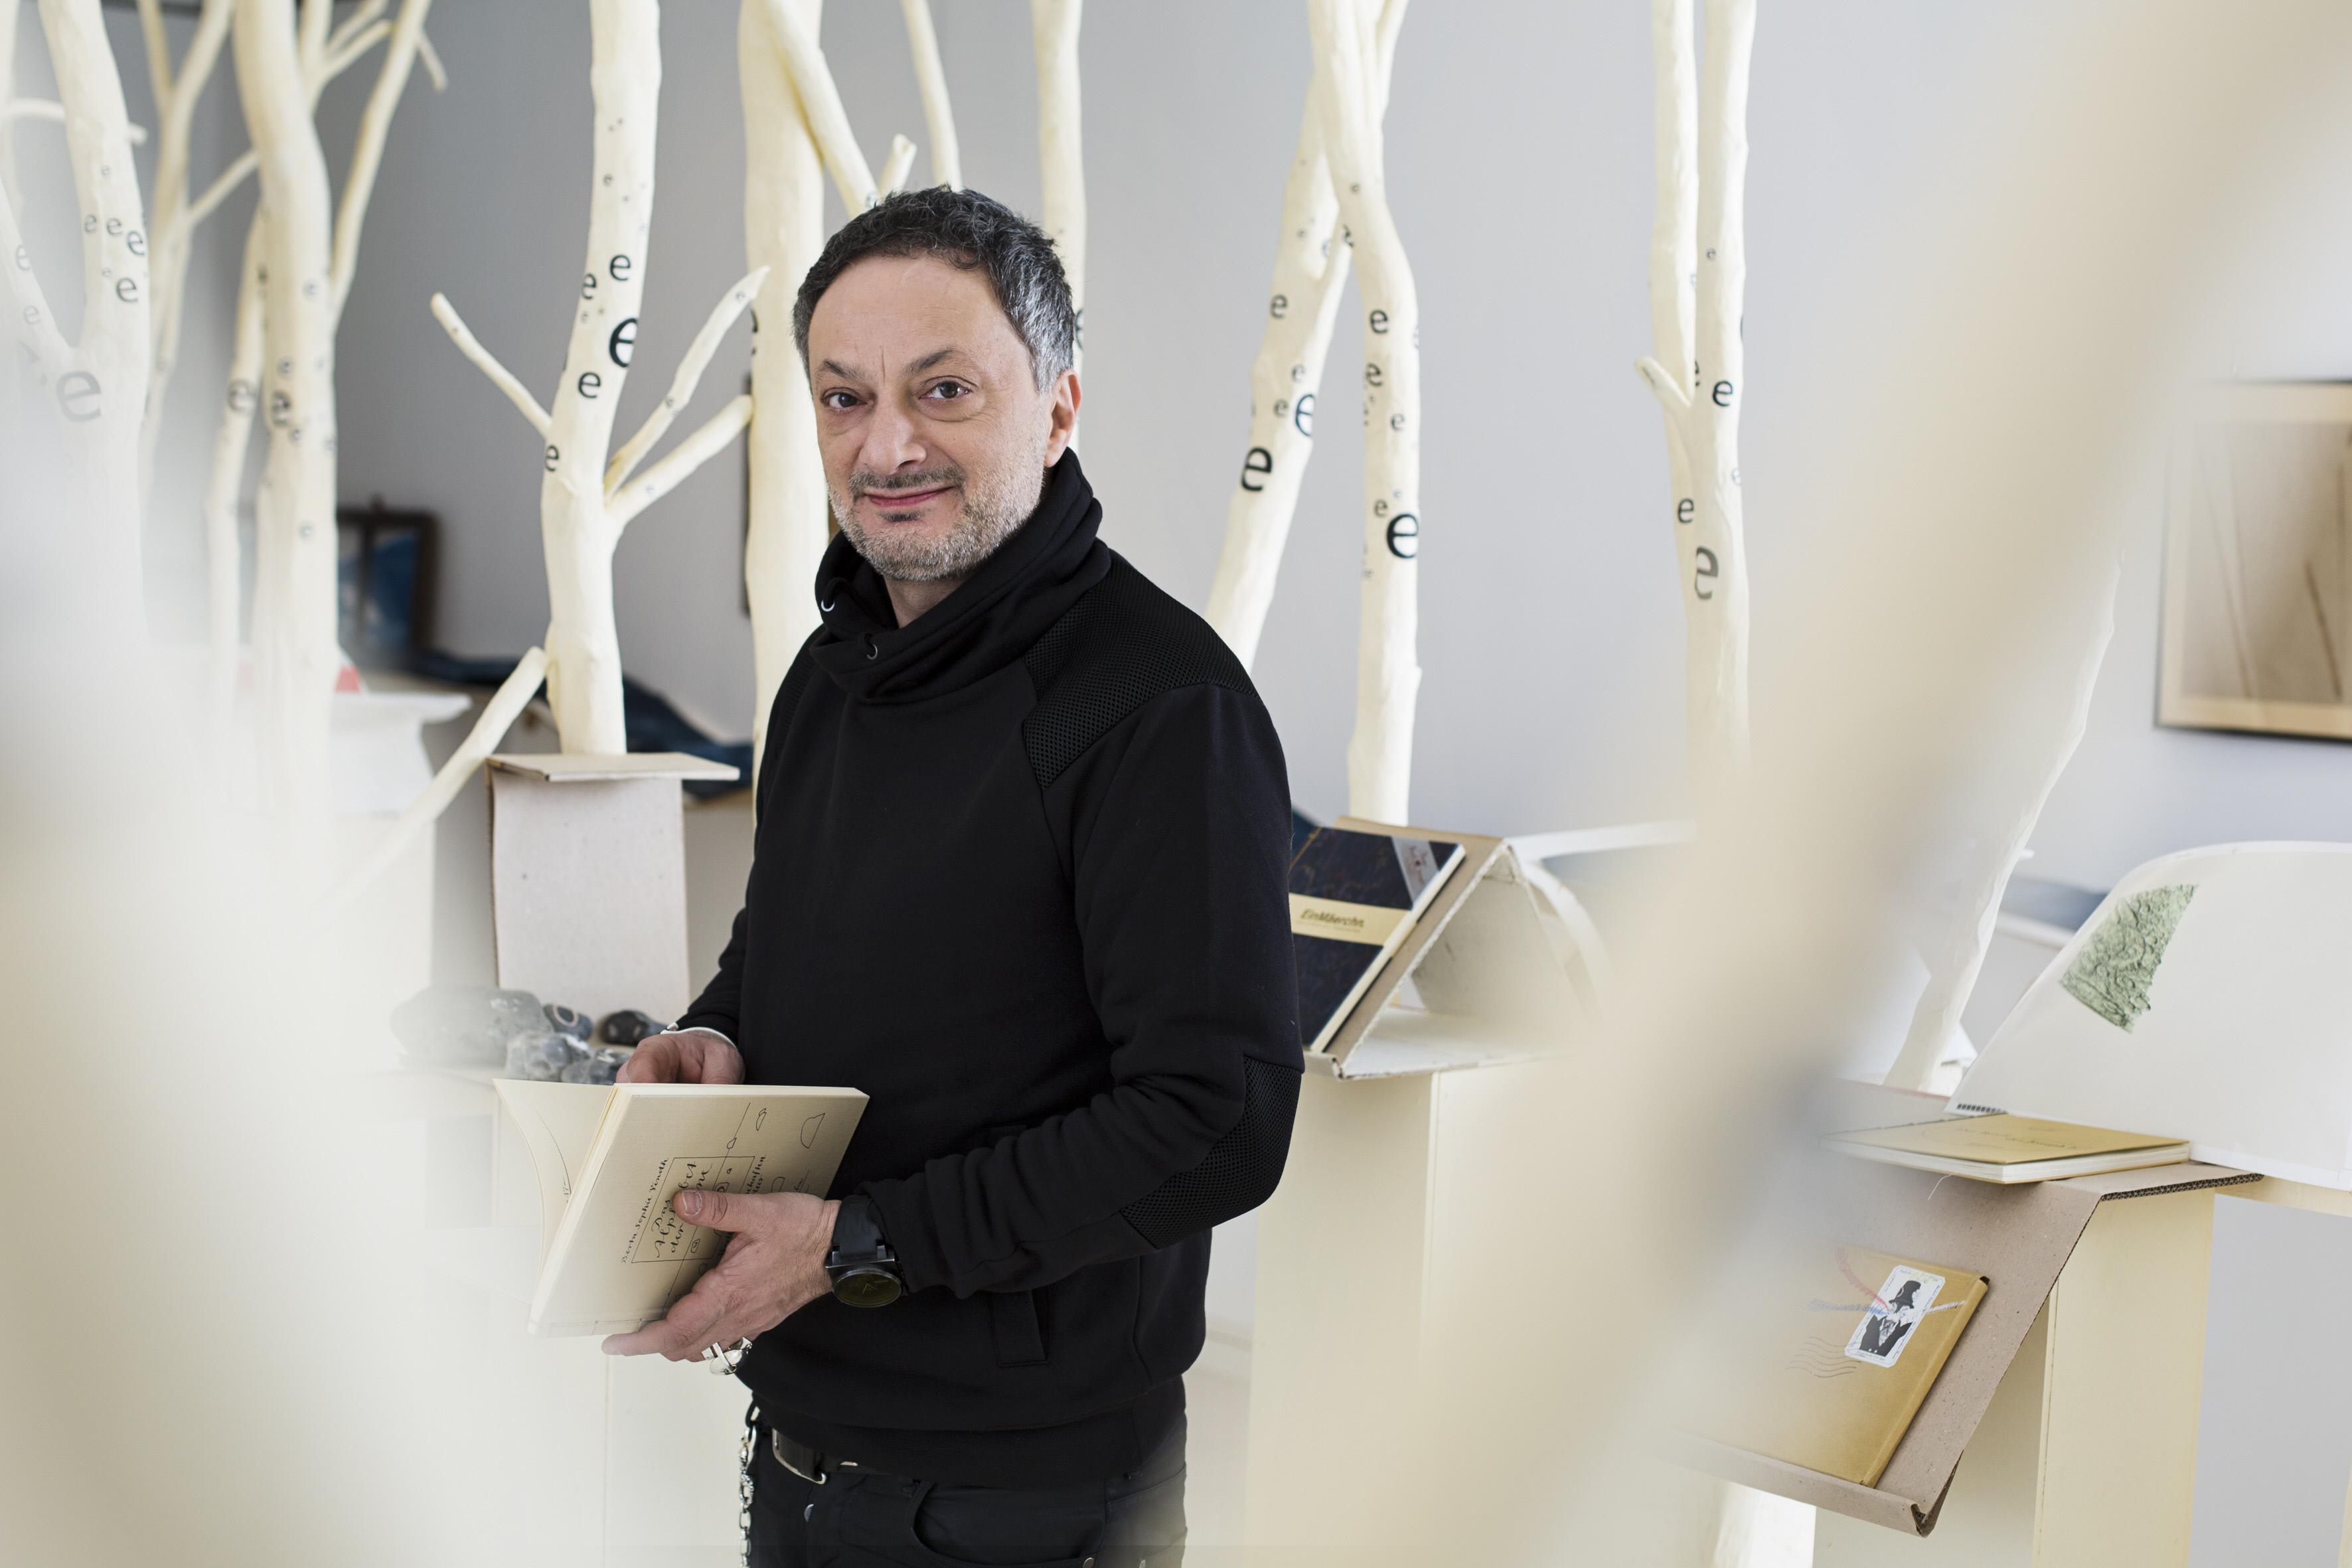 Mainzer Stadtschreiber 2015: Feridun Zaimoglu